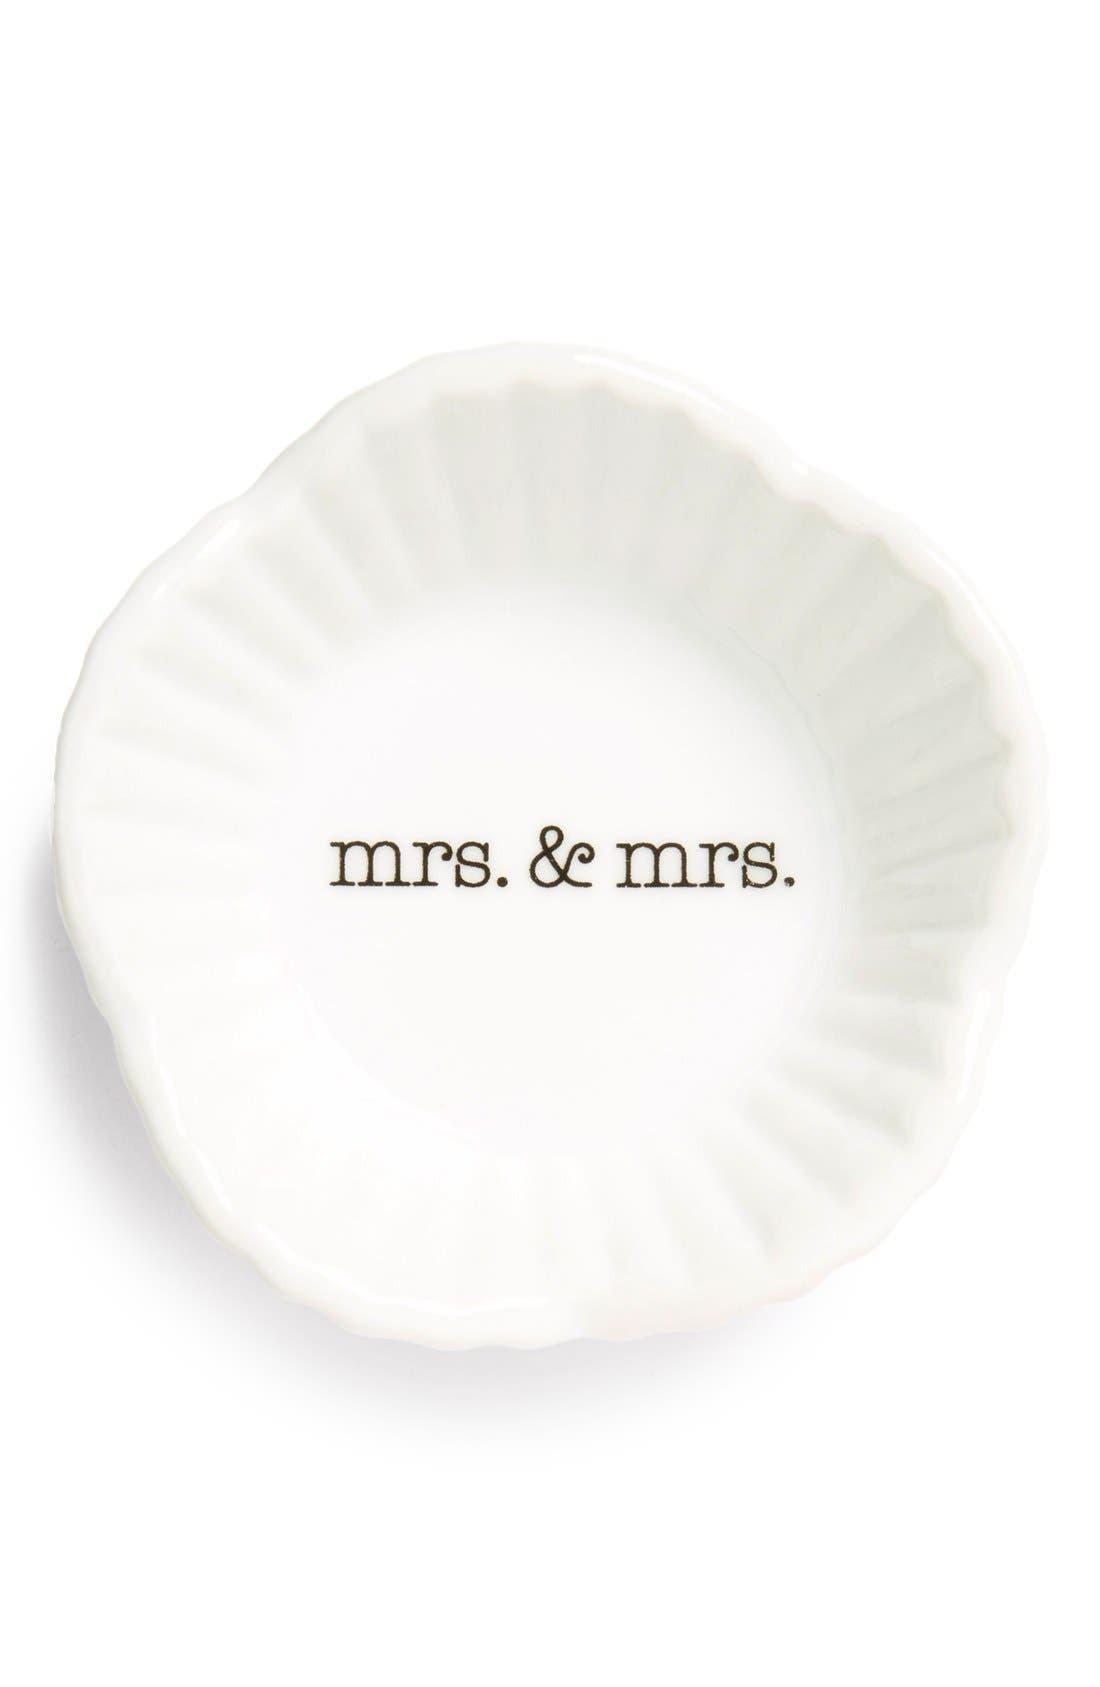 Alternate Image 1 Selected - Rosanna 'Mrs. & Mrs.' Porcelain Trinket Dish